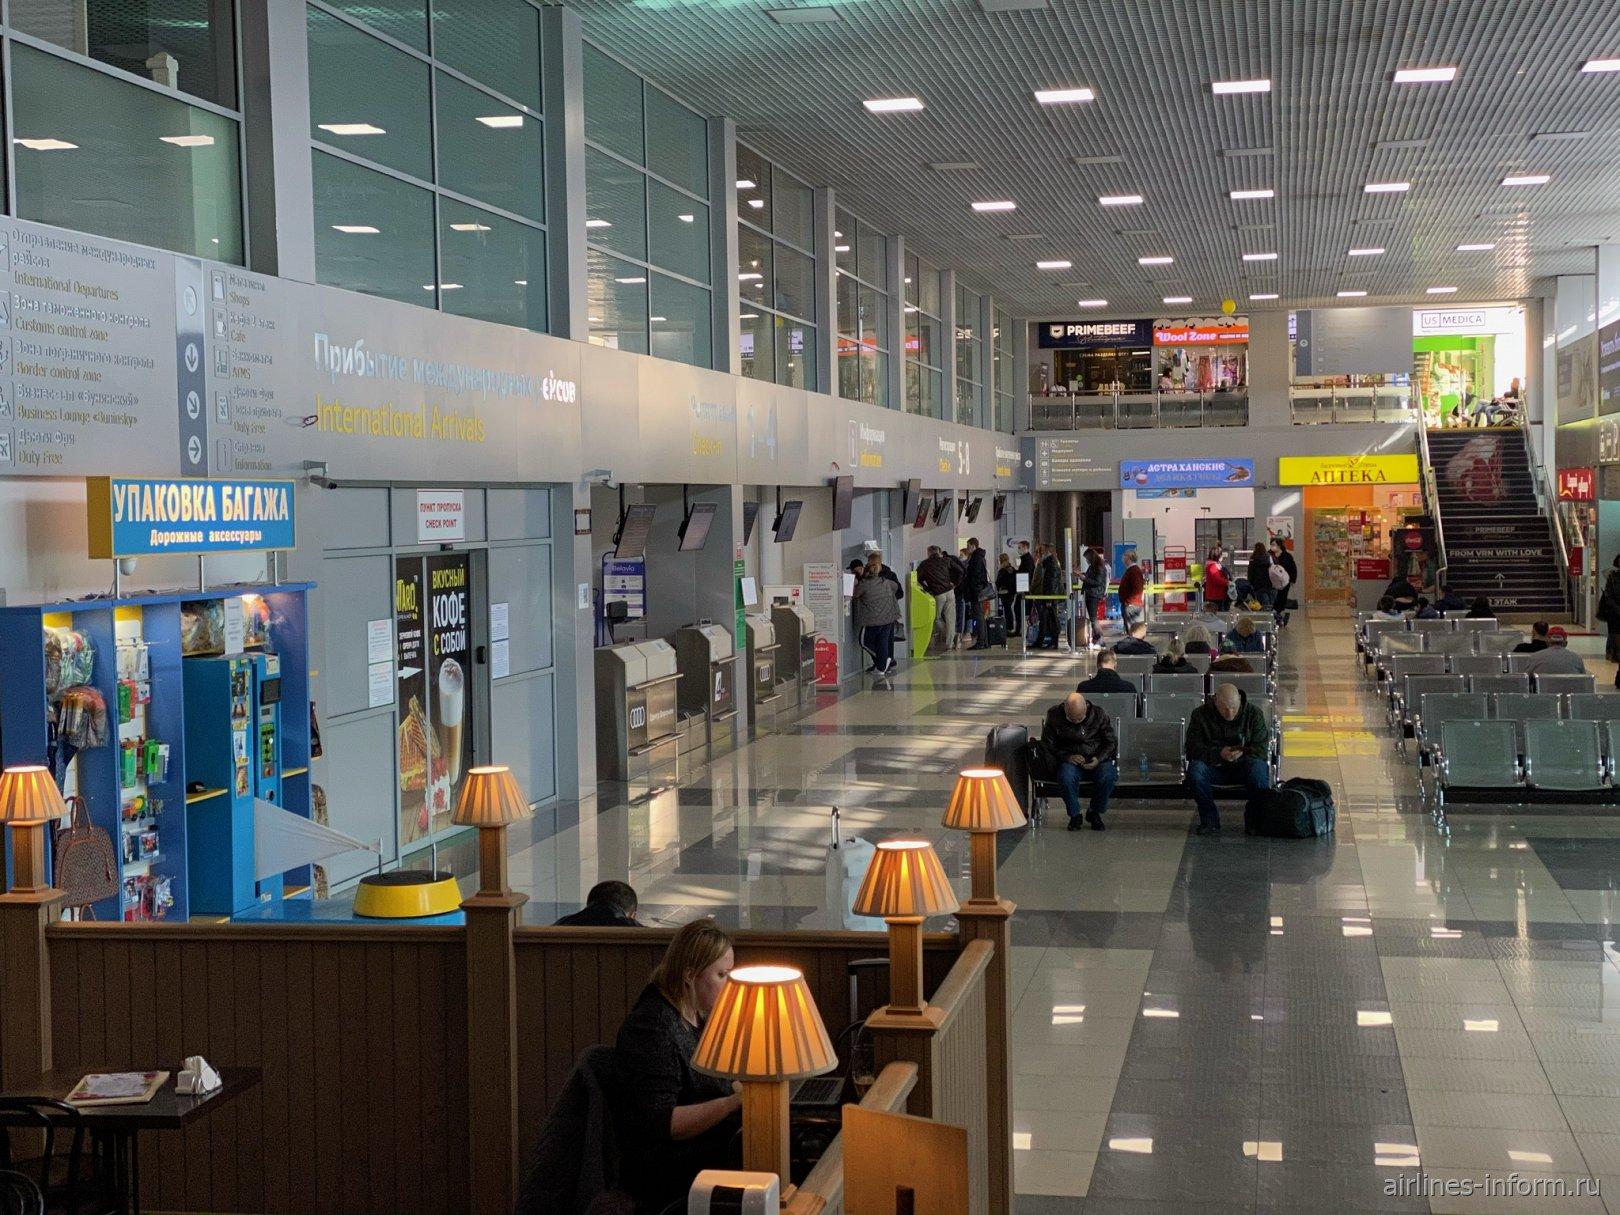 Общий зал пассажирского терминала аэропорта Воронеж